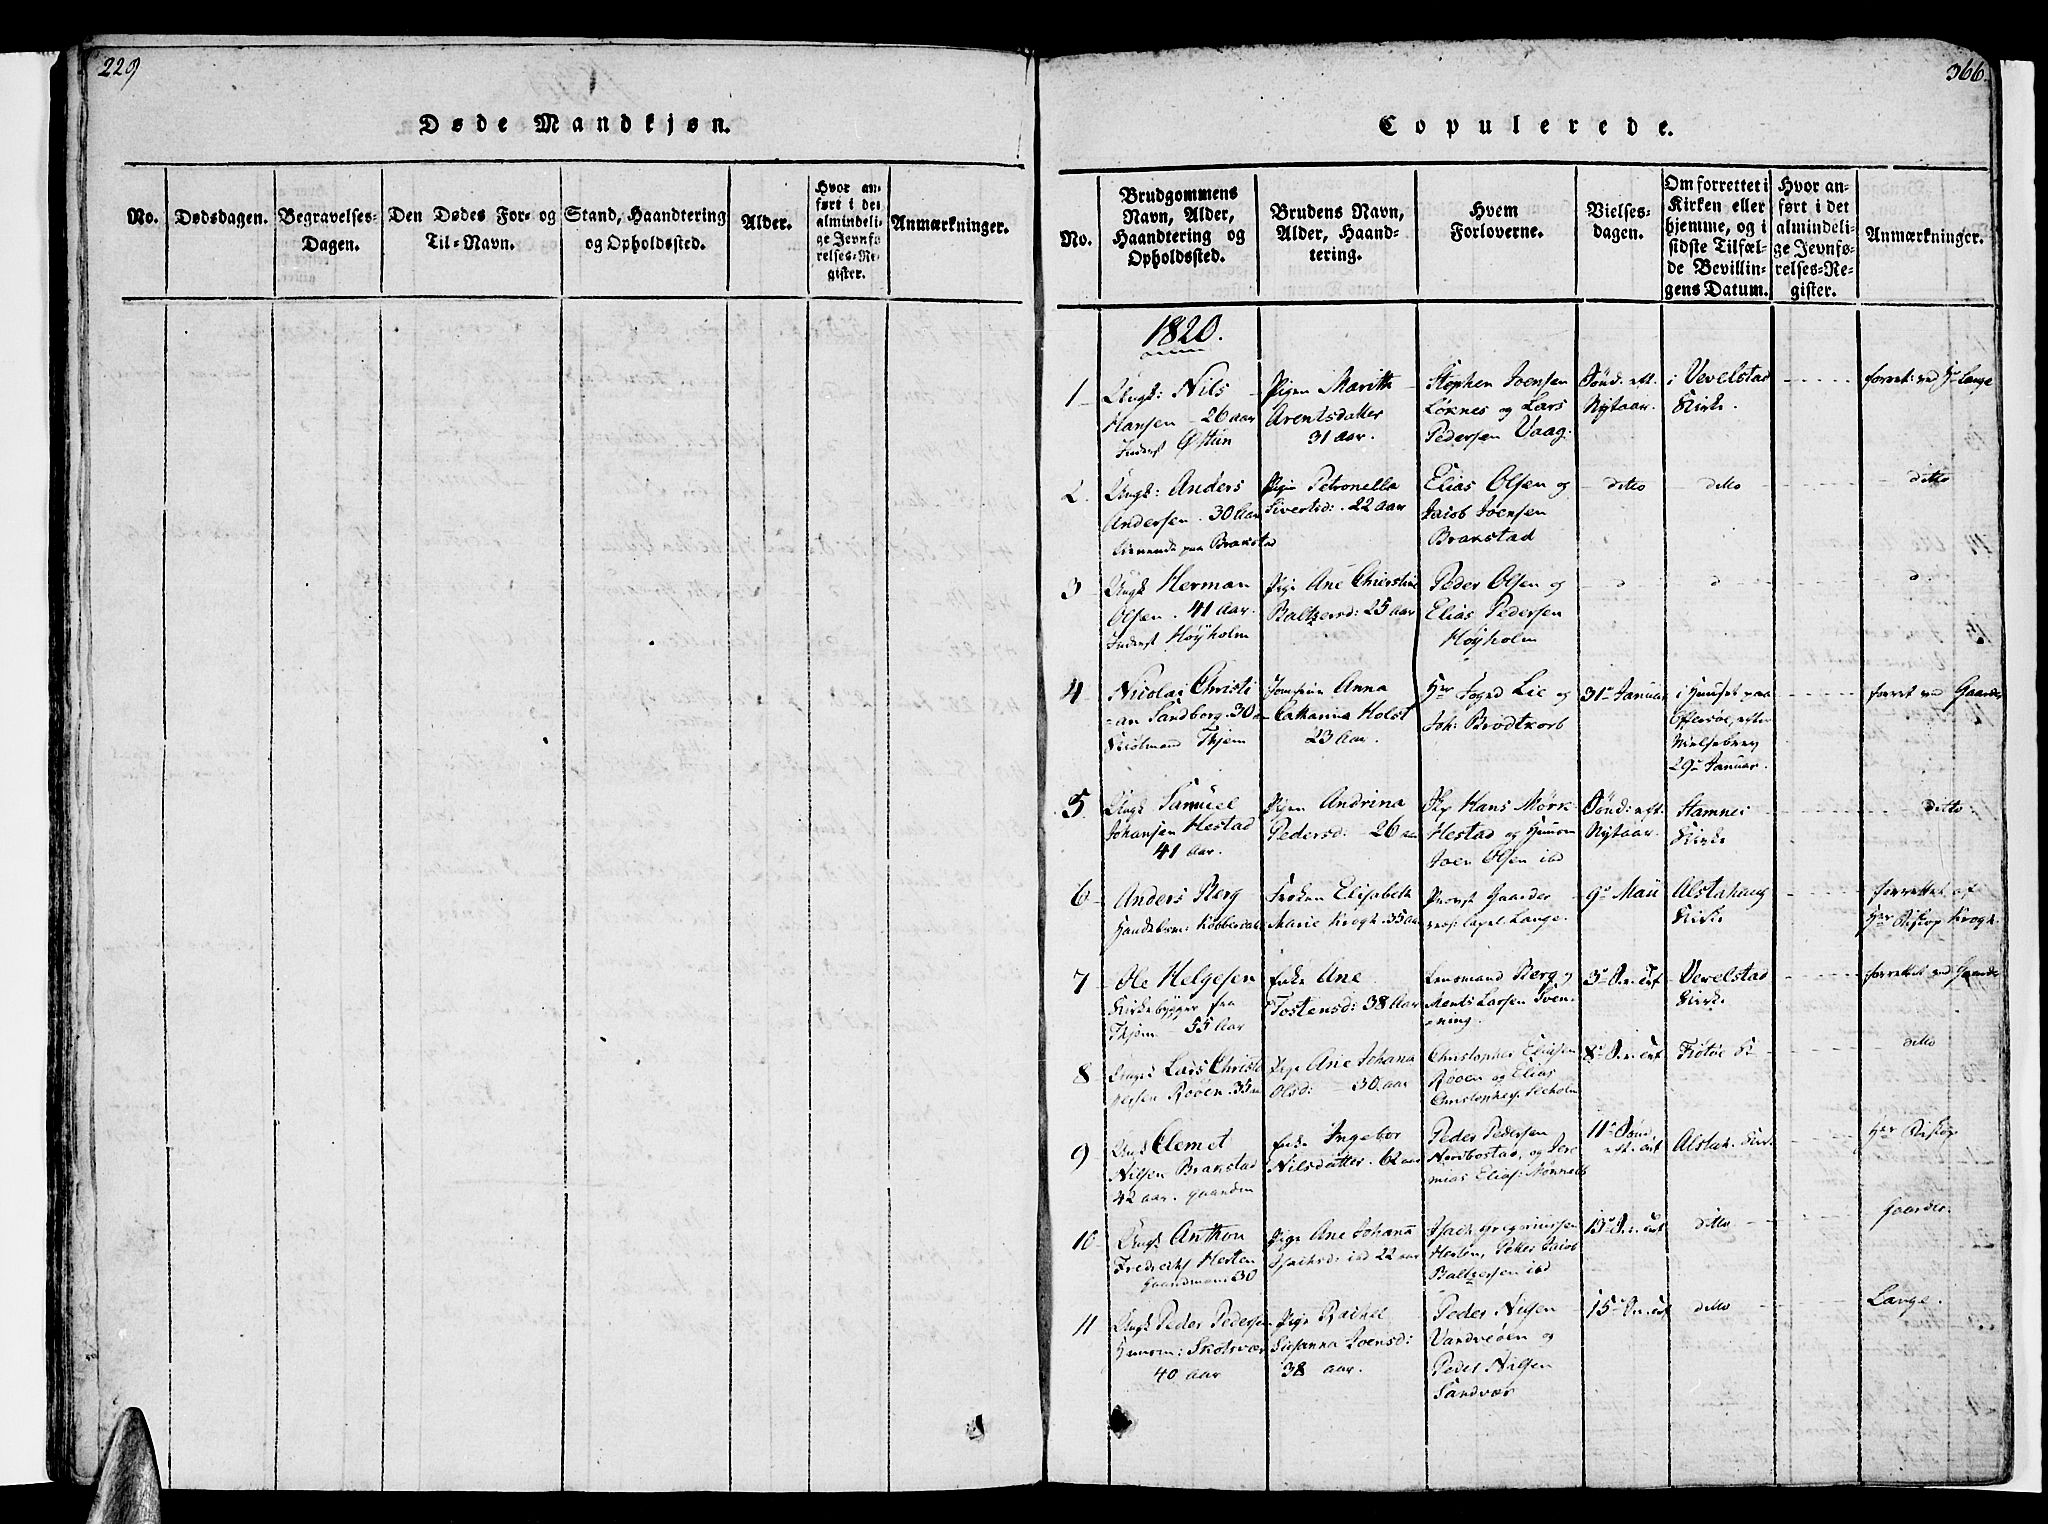 SAT, Ministerialprotokoller, klokkerbøker og fødselsregistre - Nordland, 830/L0445: Ministerialbok nr. 830A09, 1820-1830, s. 365-366